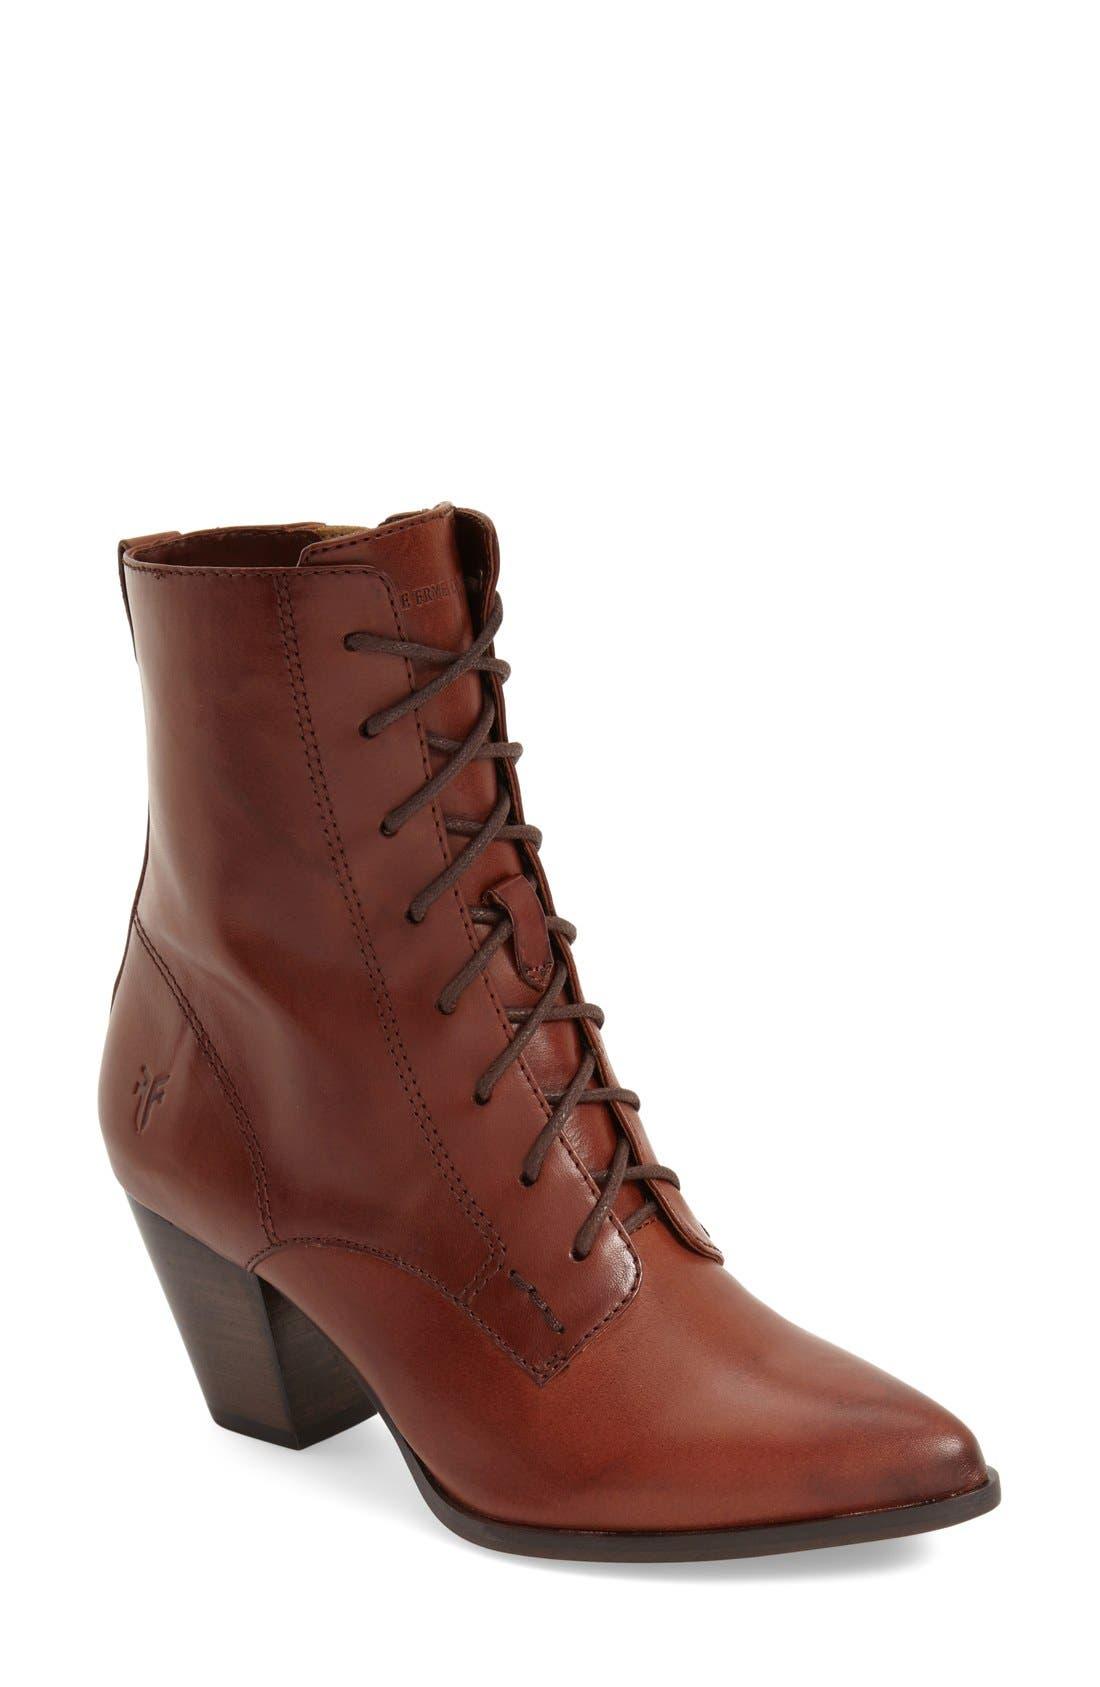 Main Image - Frye 'Renee' Lace Up Boot (Women)